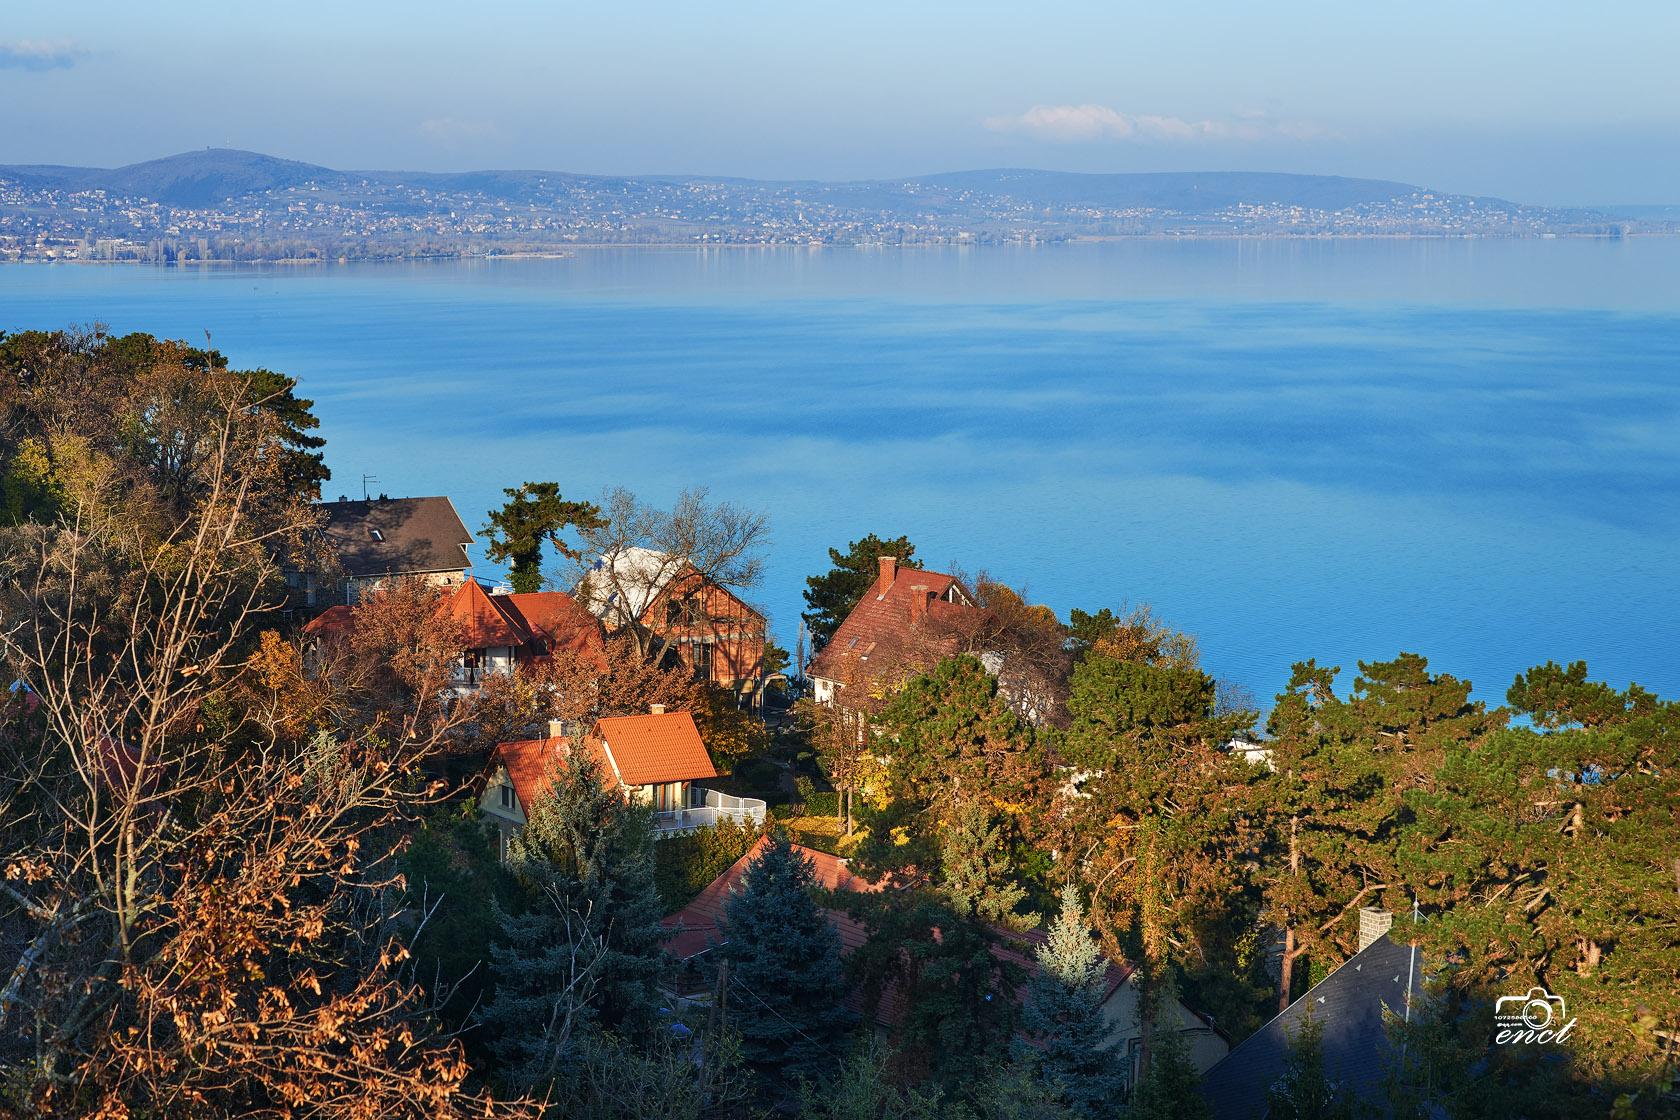 enct作品:匈牙利巴拉顿湖风光